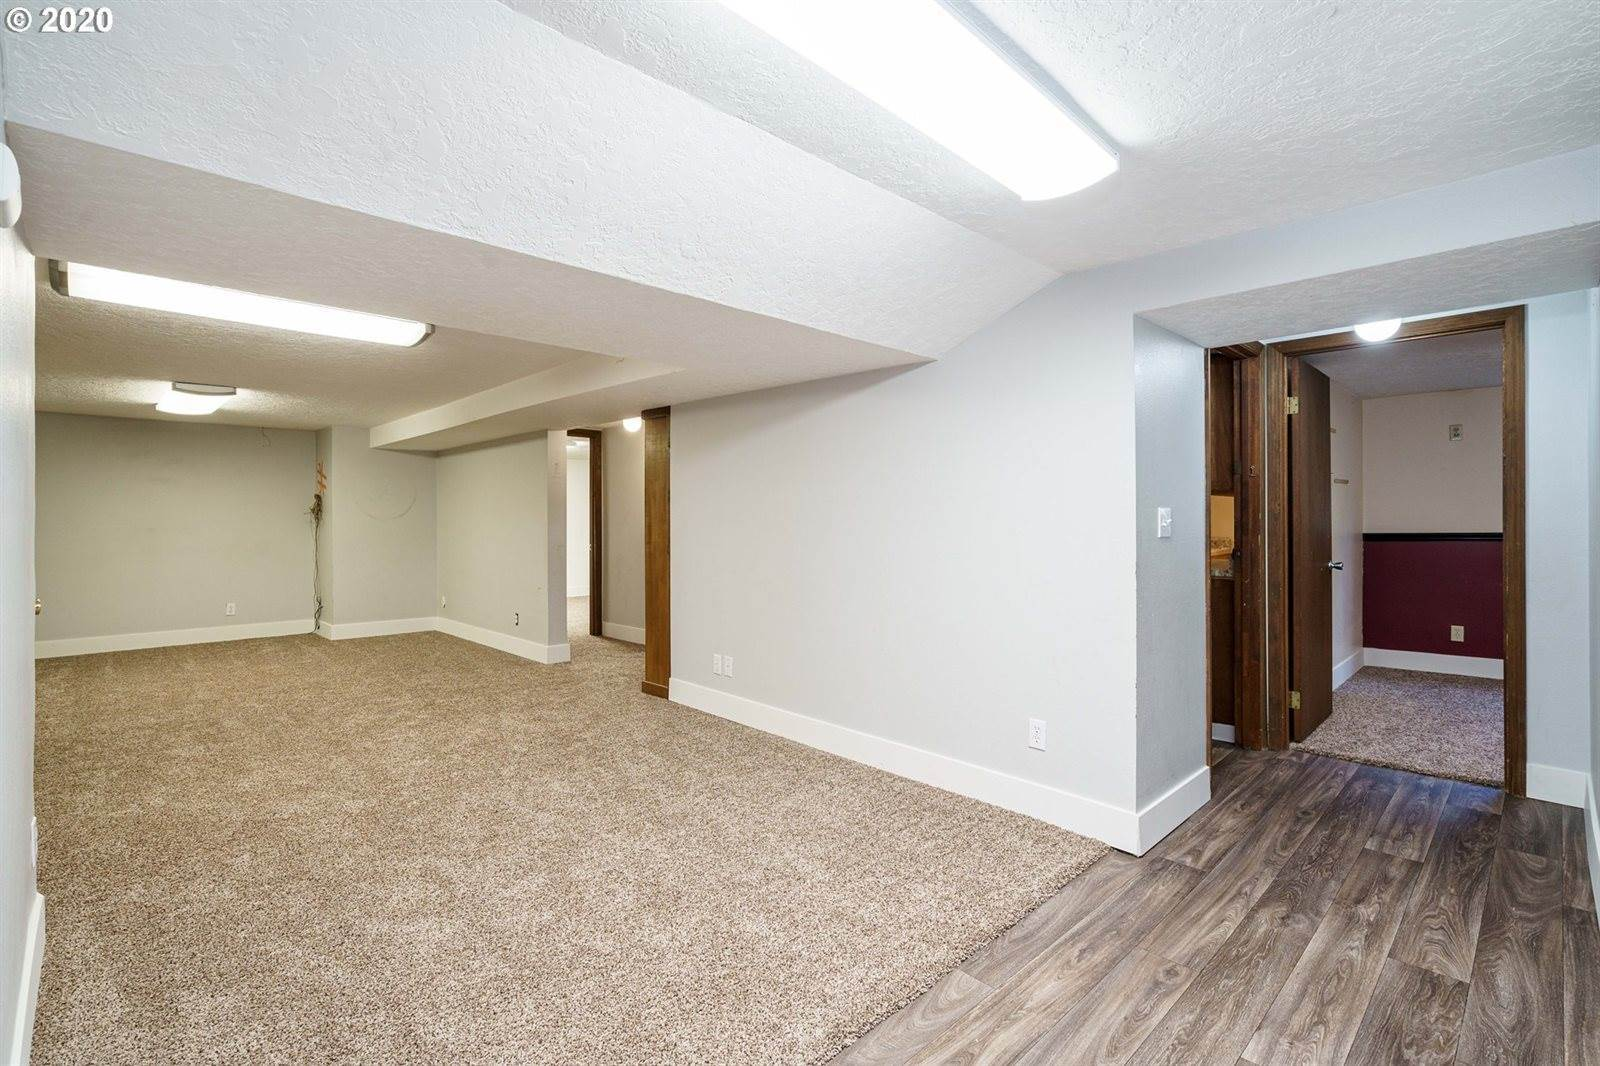 748 NE 127TH Ave, Portland, OR 97230